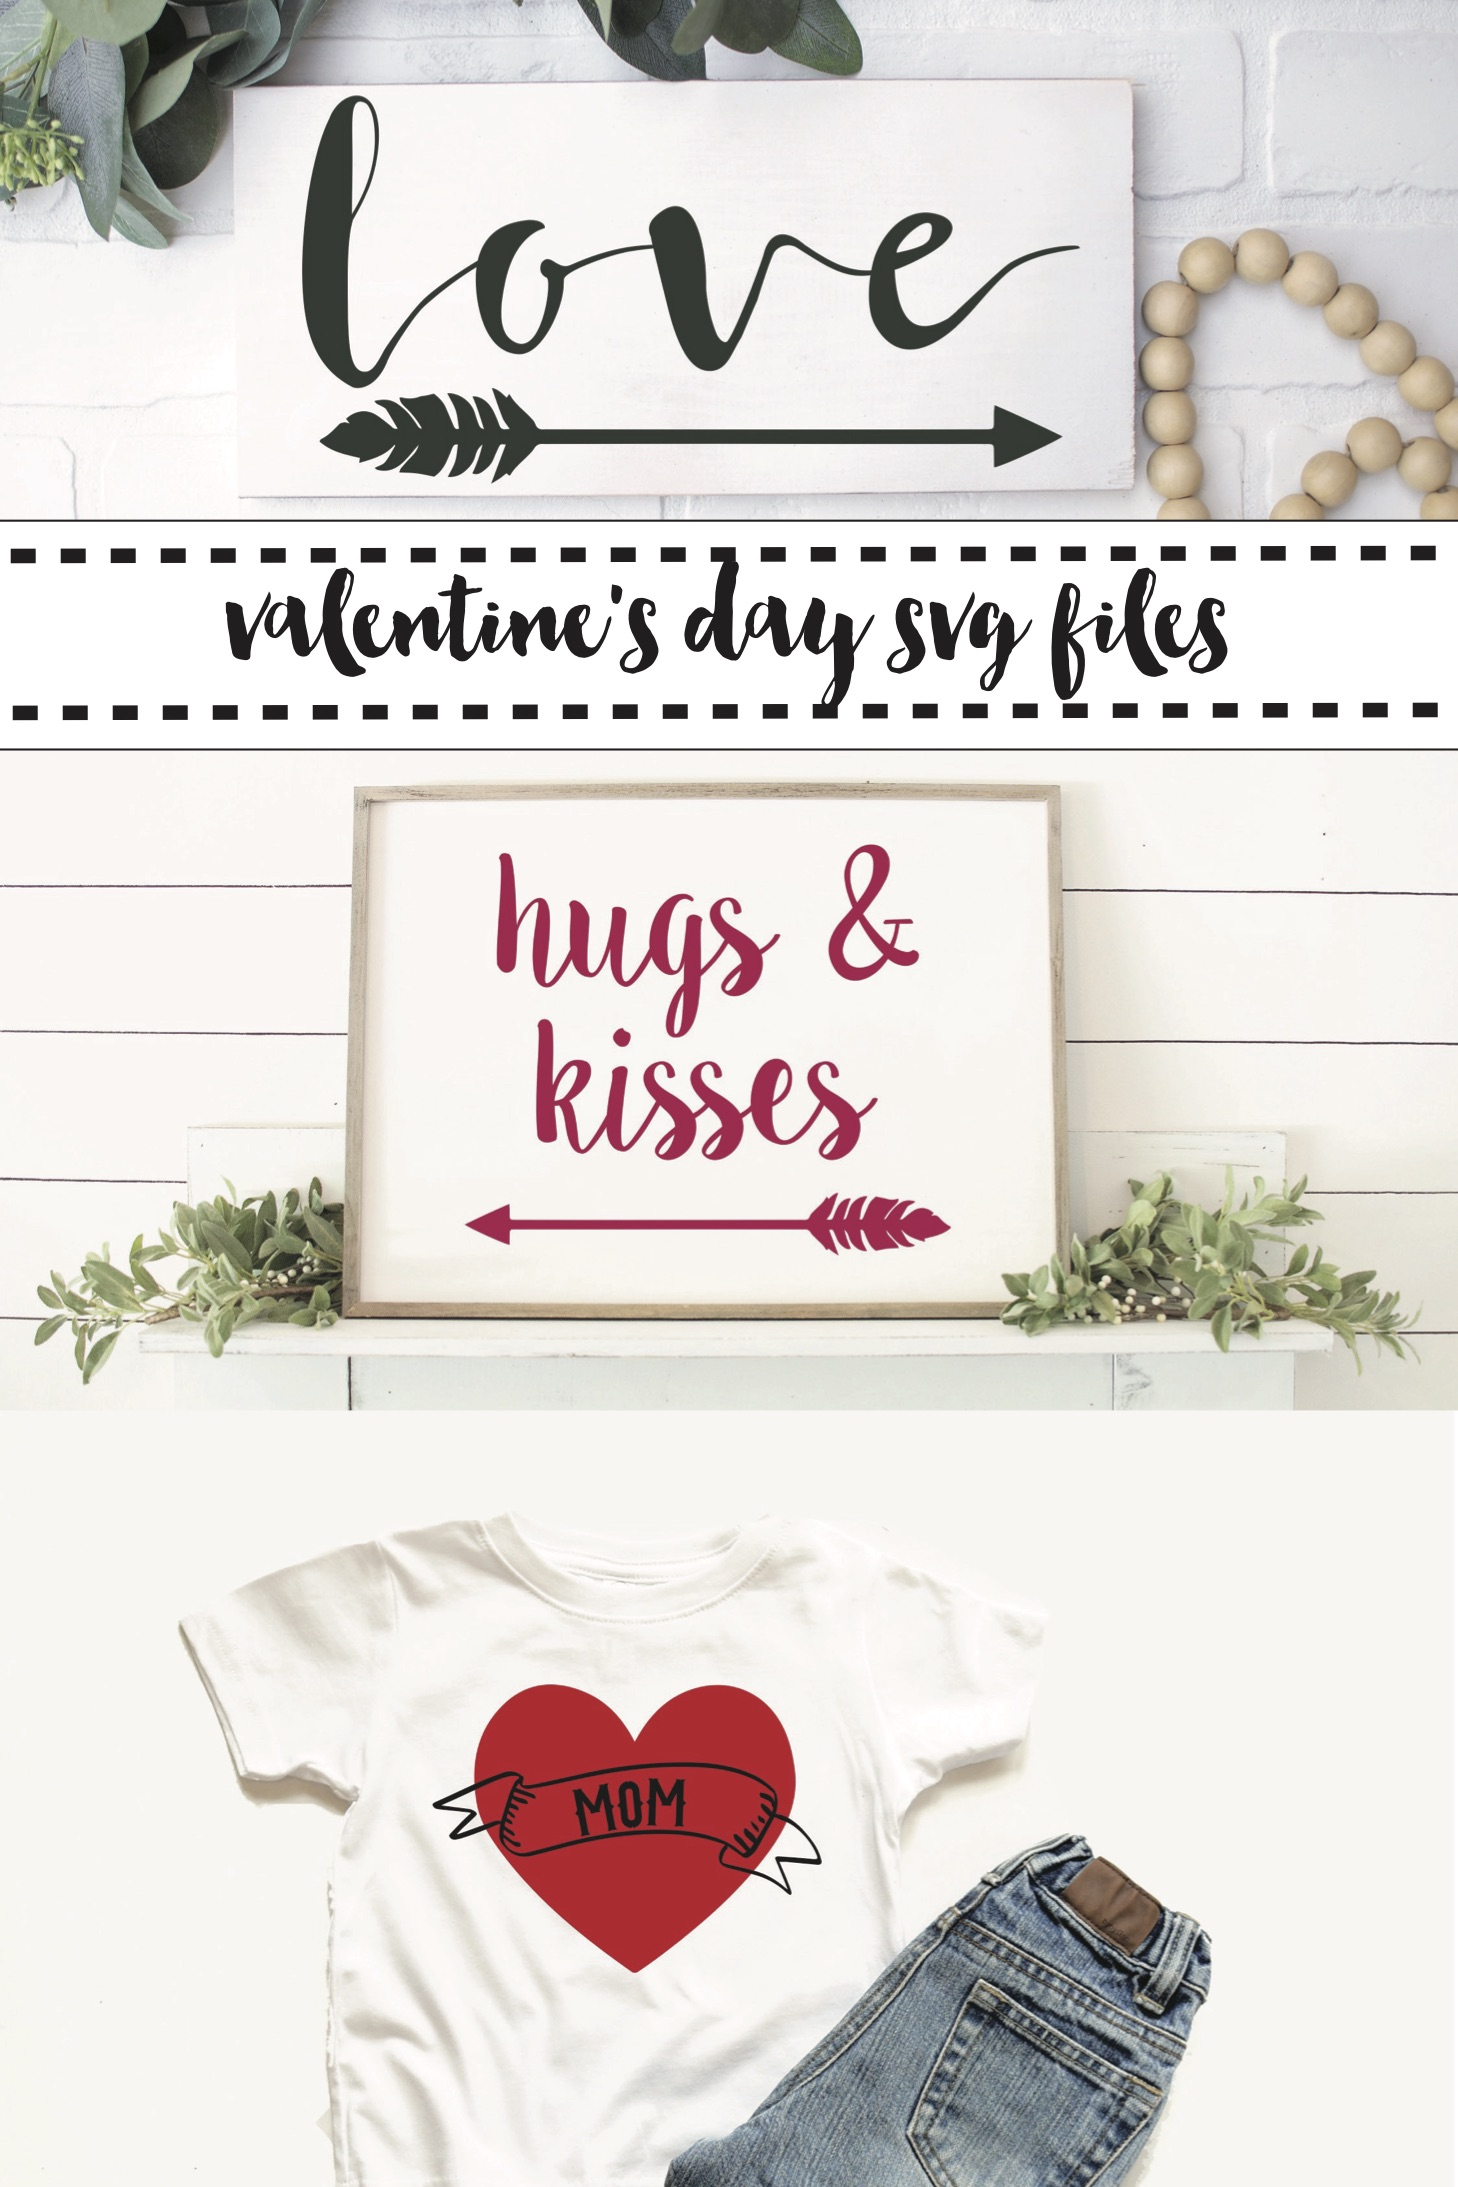 Farmhouse Style Signs Boy's Valentine's Day Shirt